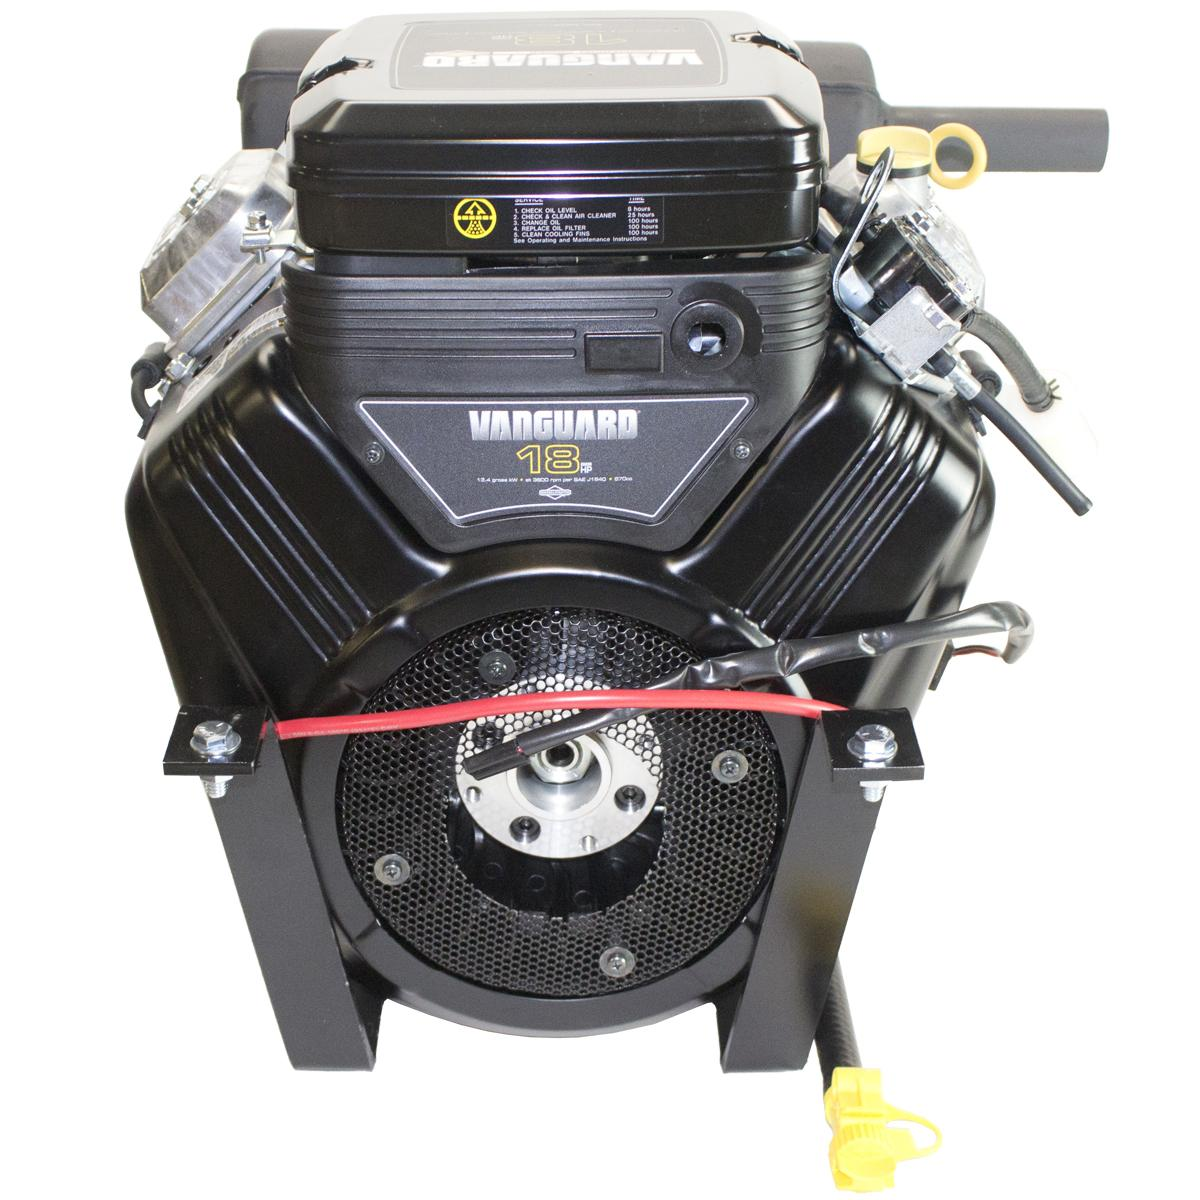 18hp Horizontal Shaft, Conversion kit to fit John Deere 312, 314, & 316 with single cyl Kohler Briggs & Stratton Engine, Briggs